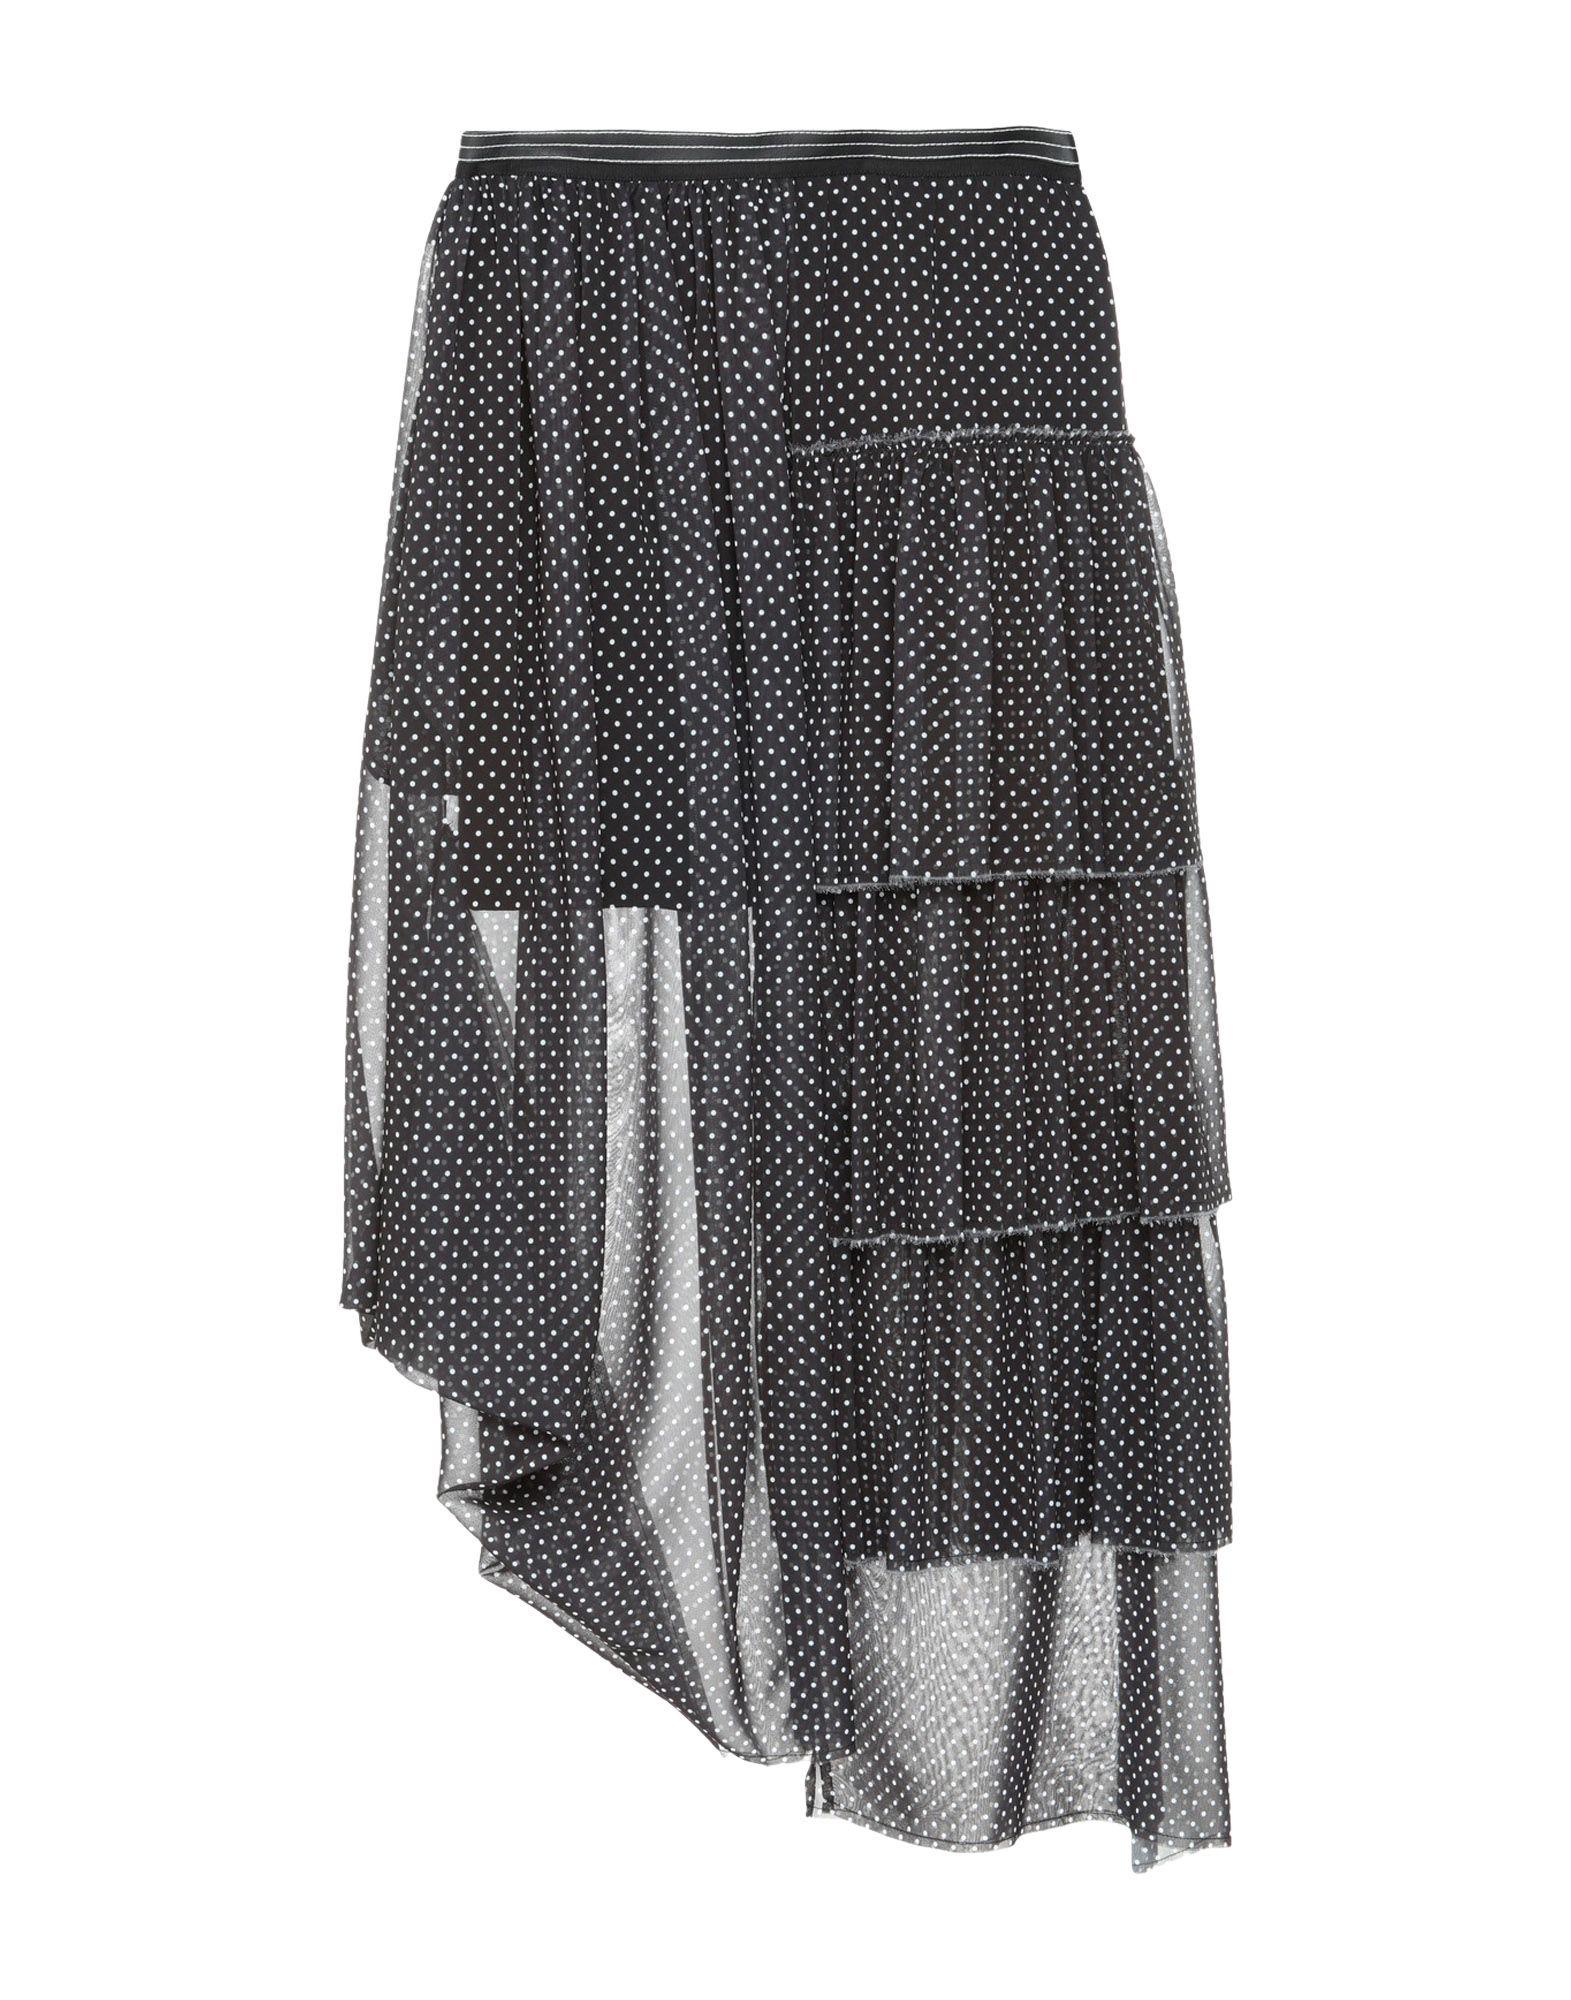 LOEWE Длинная юбка loewe длинная юбка